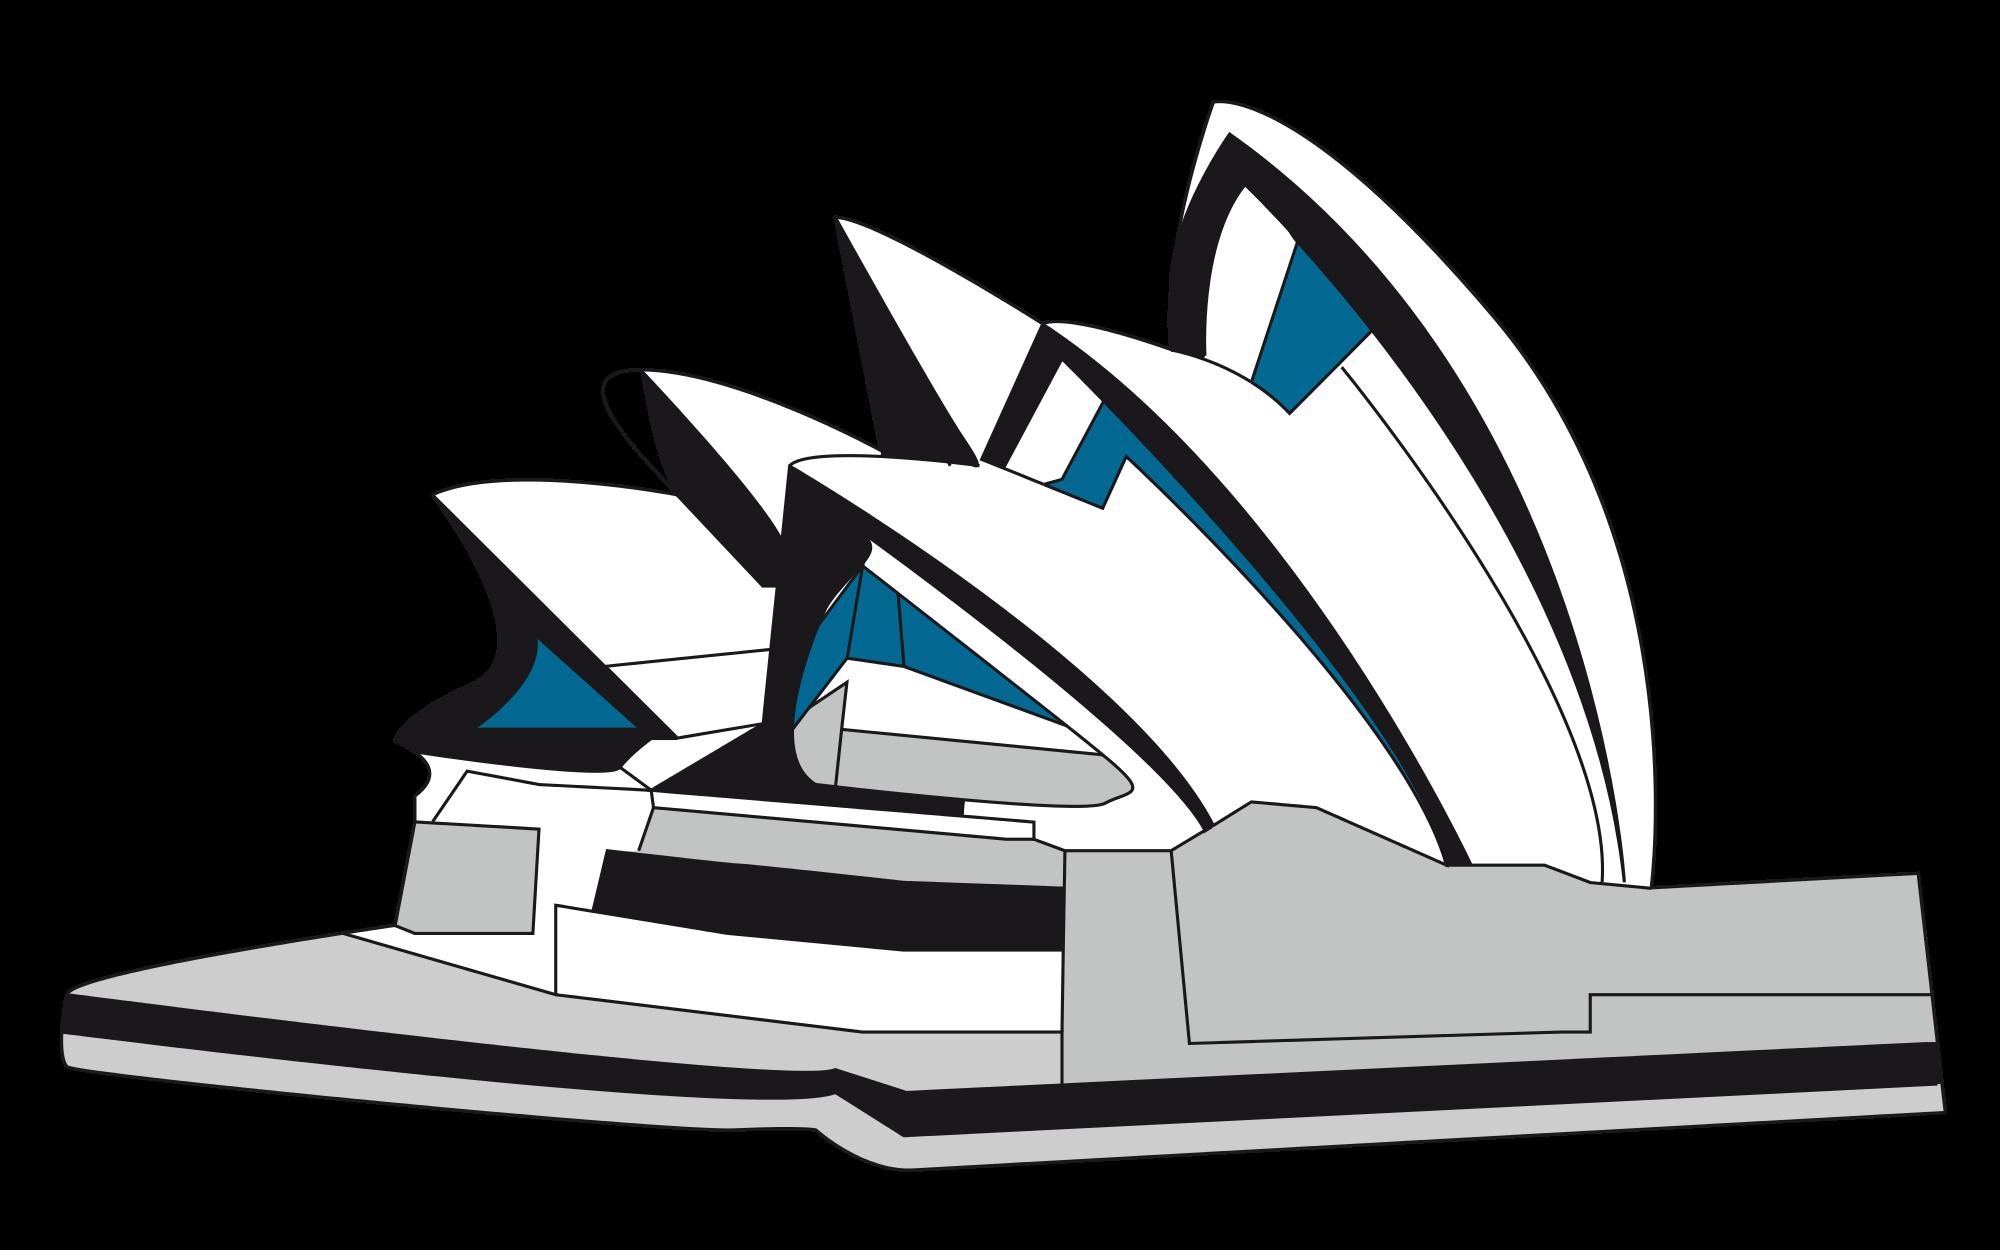 PNG Sydney Opera House - 57802